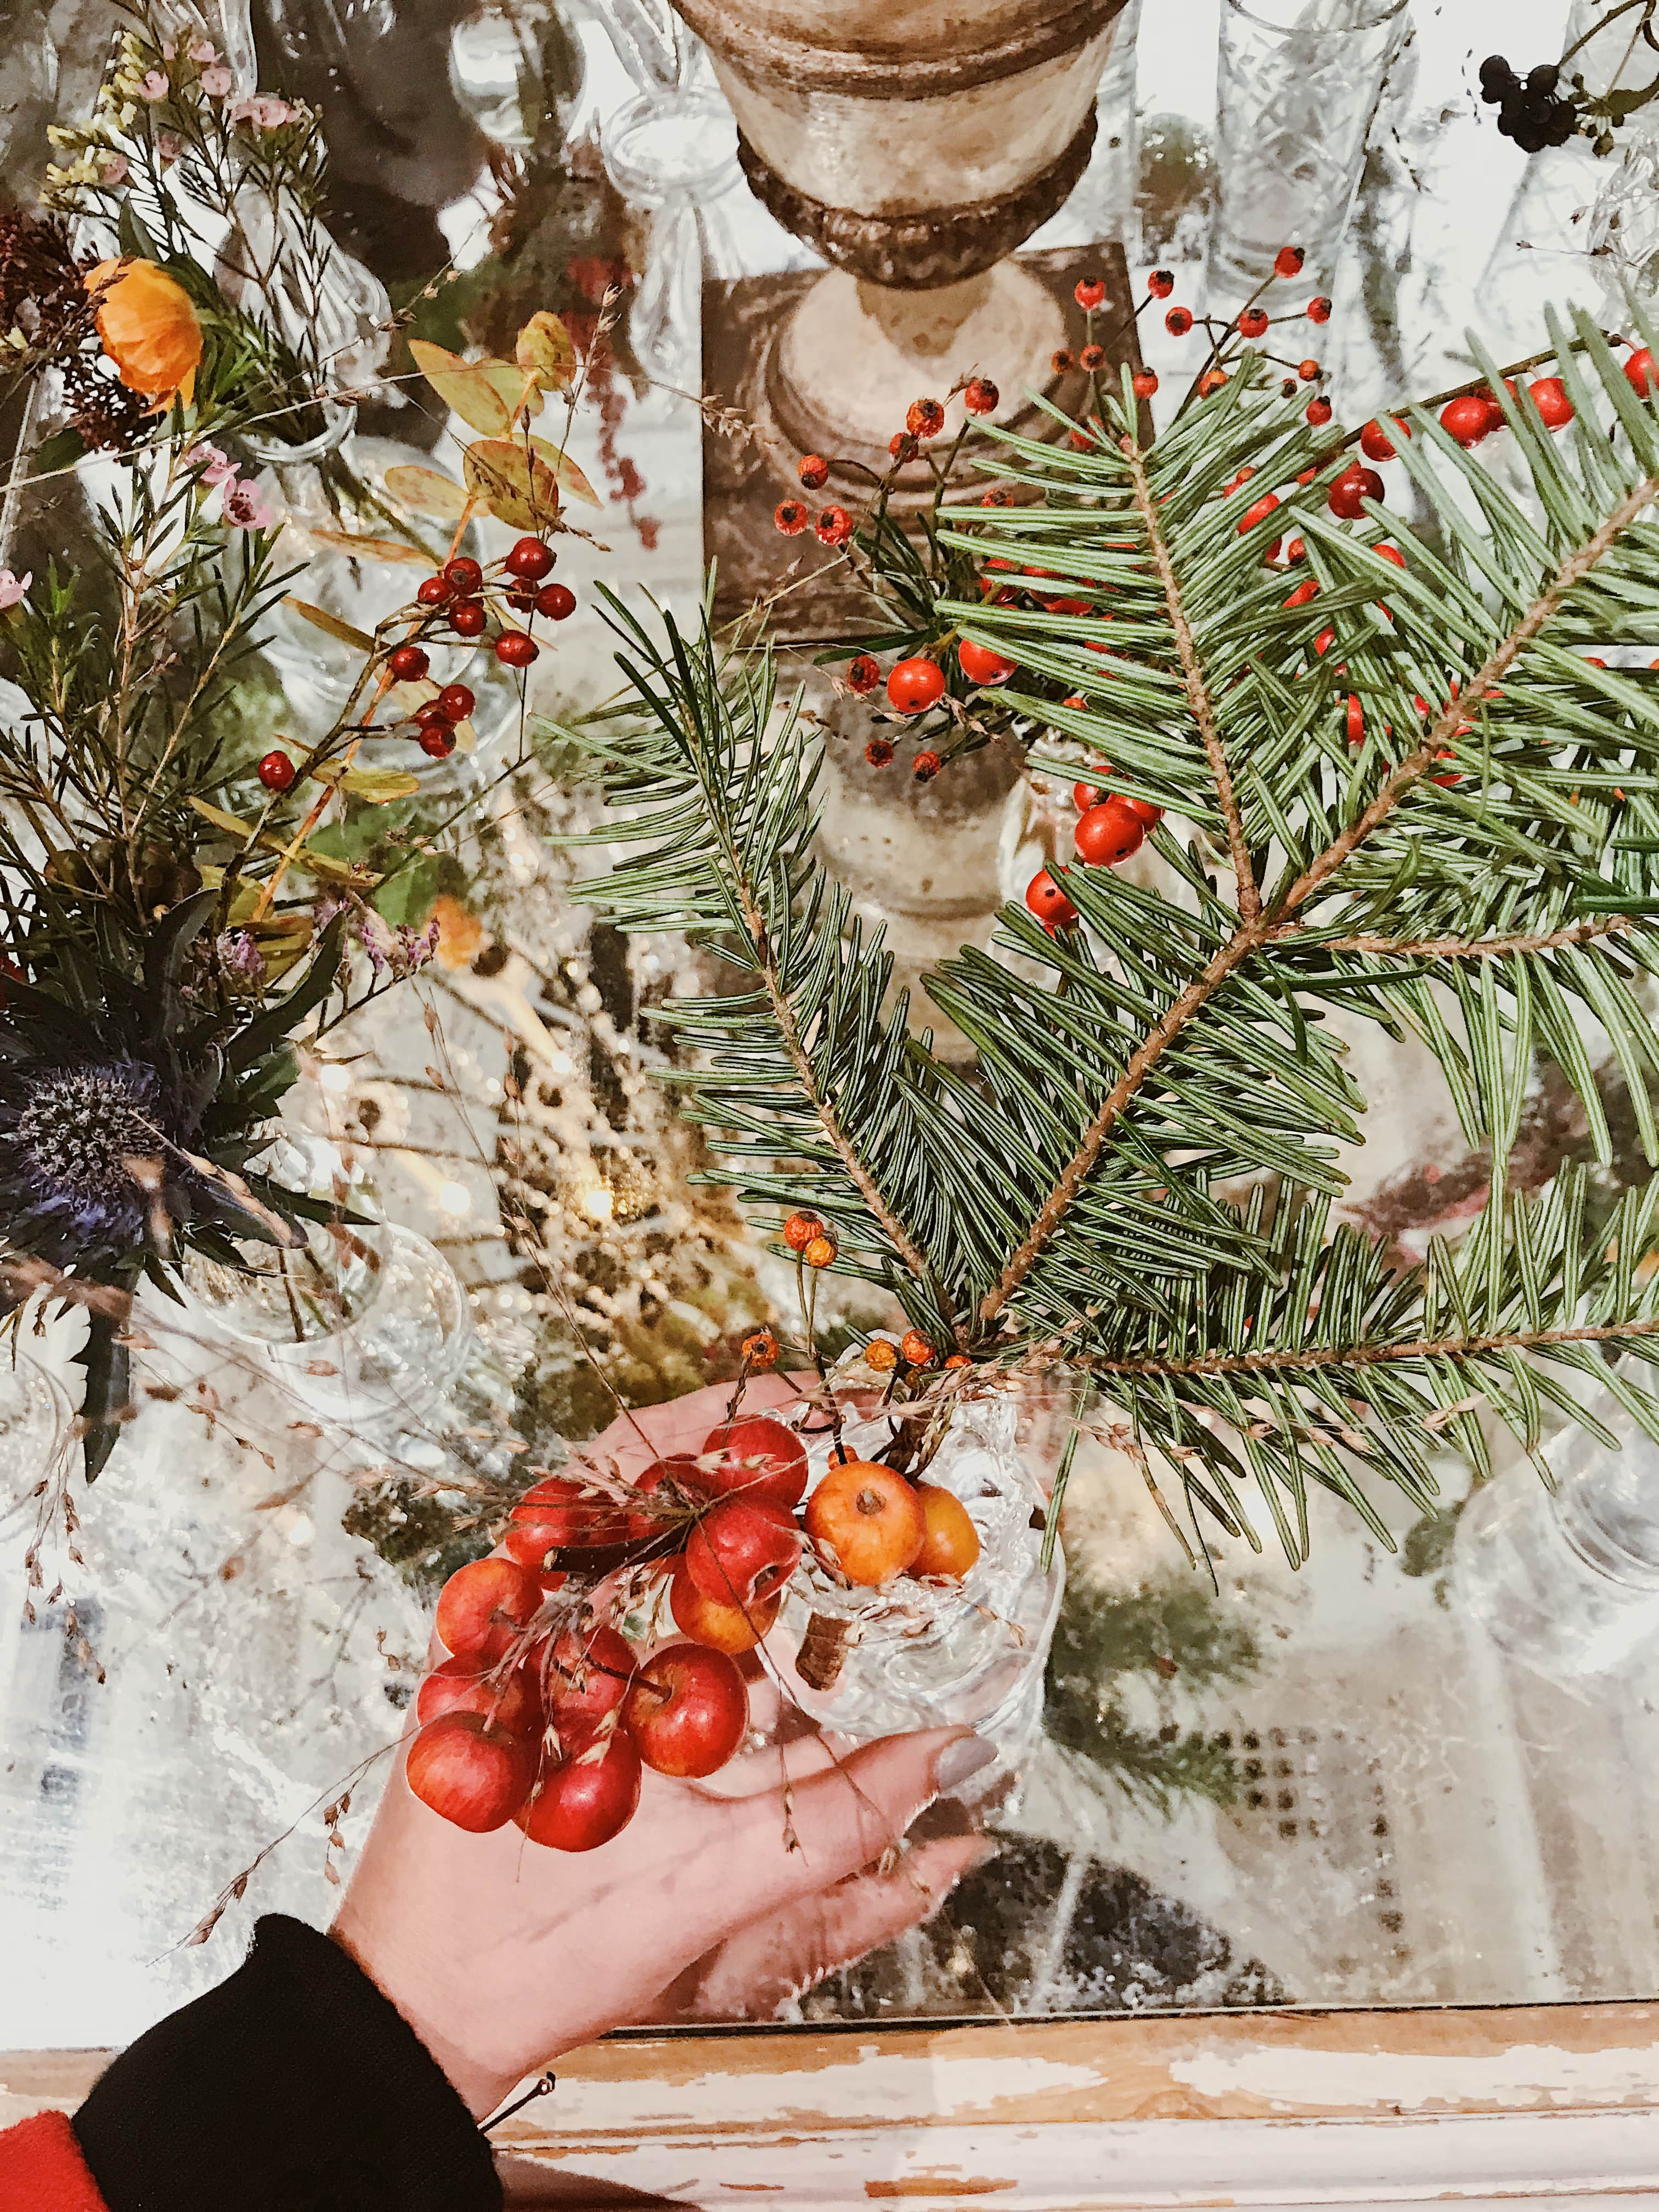 Petersham Nurseries Christmas Season at Covent Garden